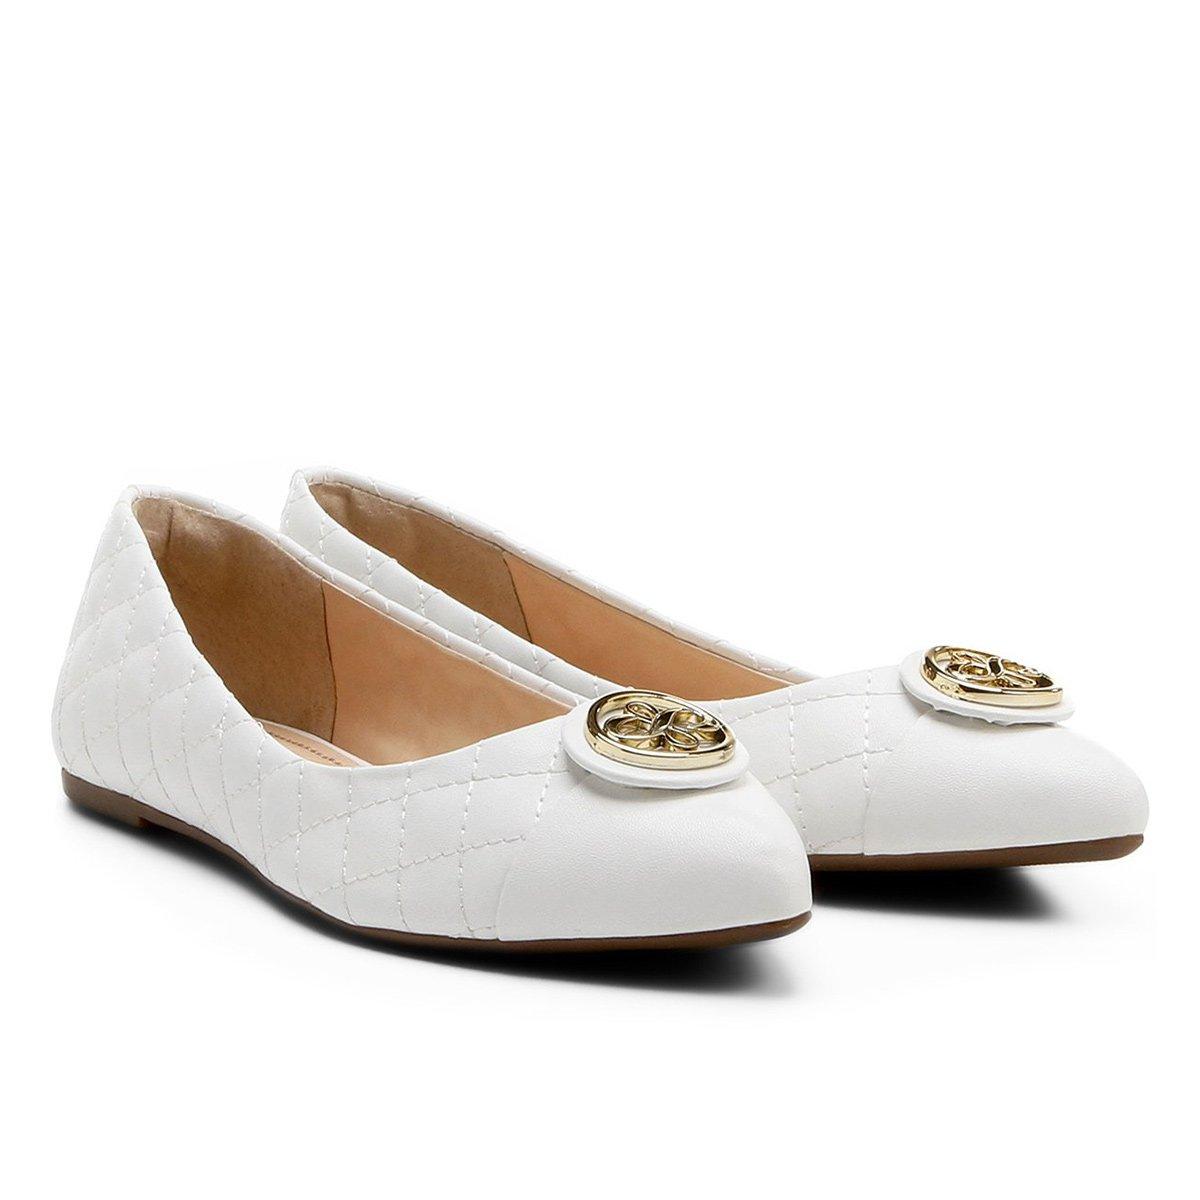 471c7cf7de ... Sapatilha Shoestock Bico Fino Matelassê